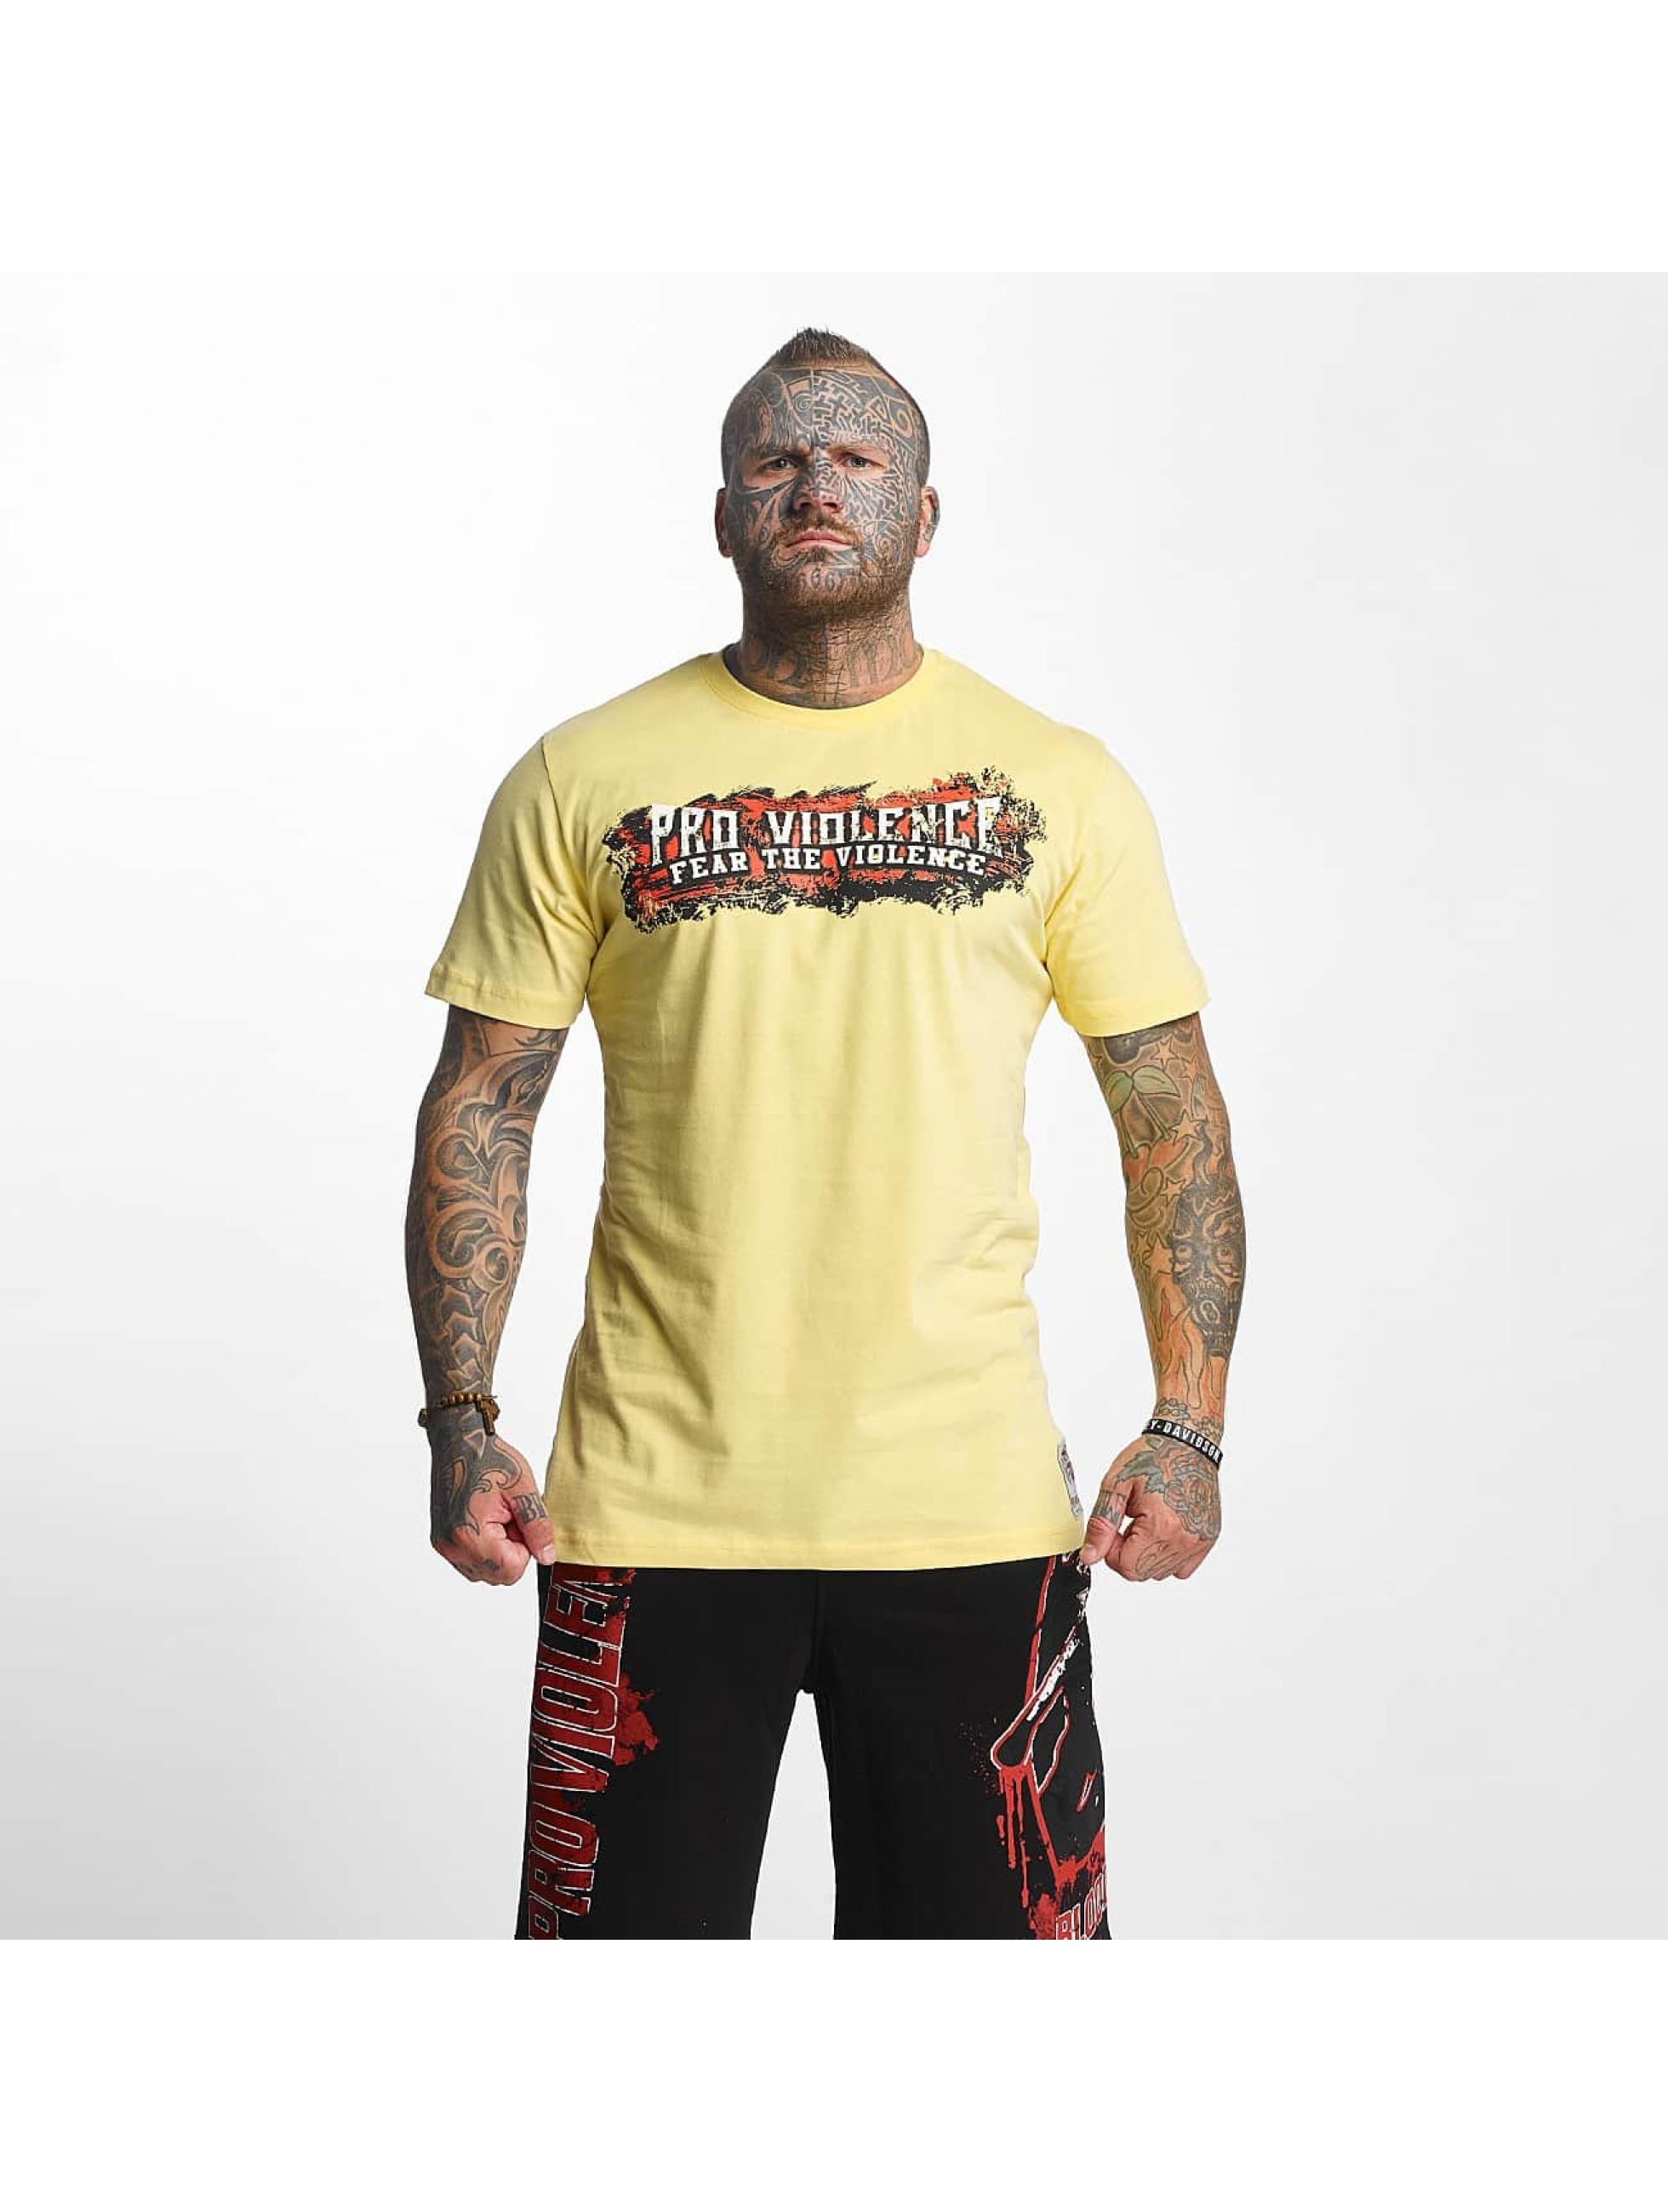 Pro Violence Streetwear Männer T-Shirt The Violence Fear in gelb